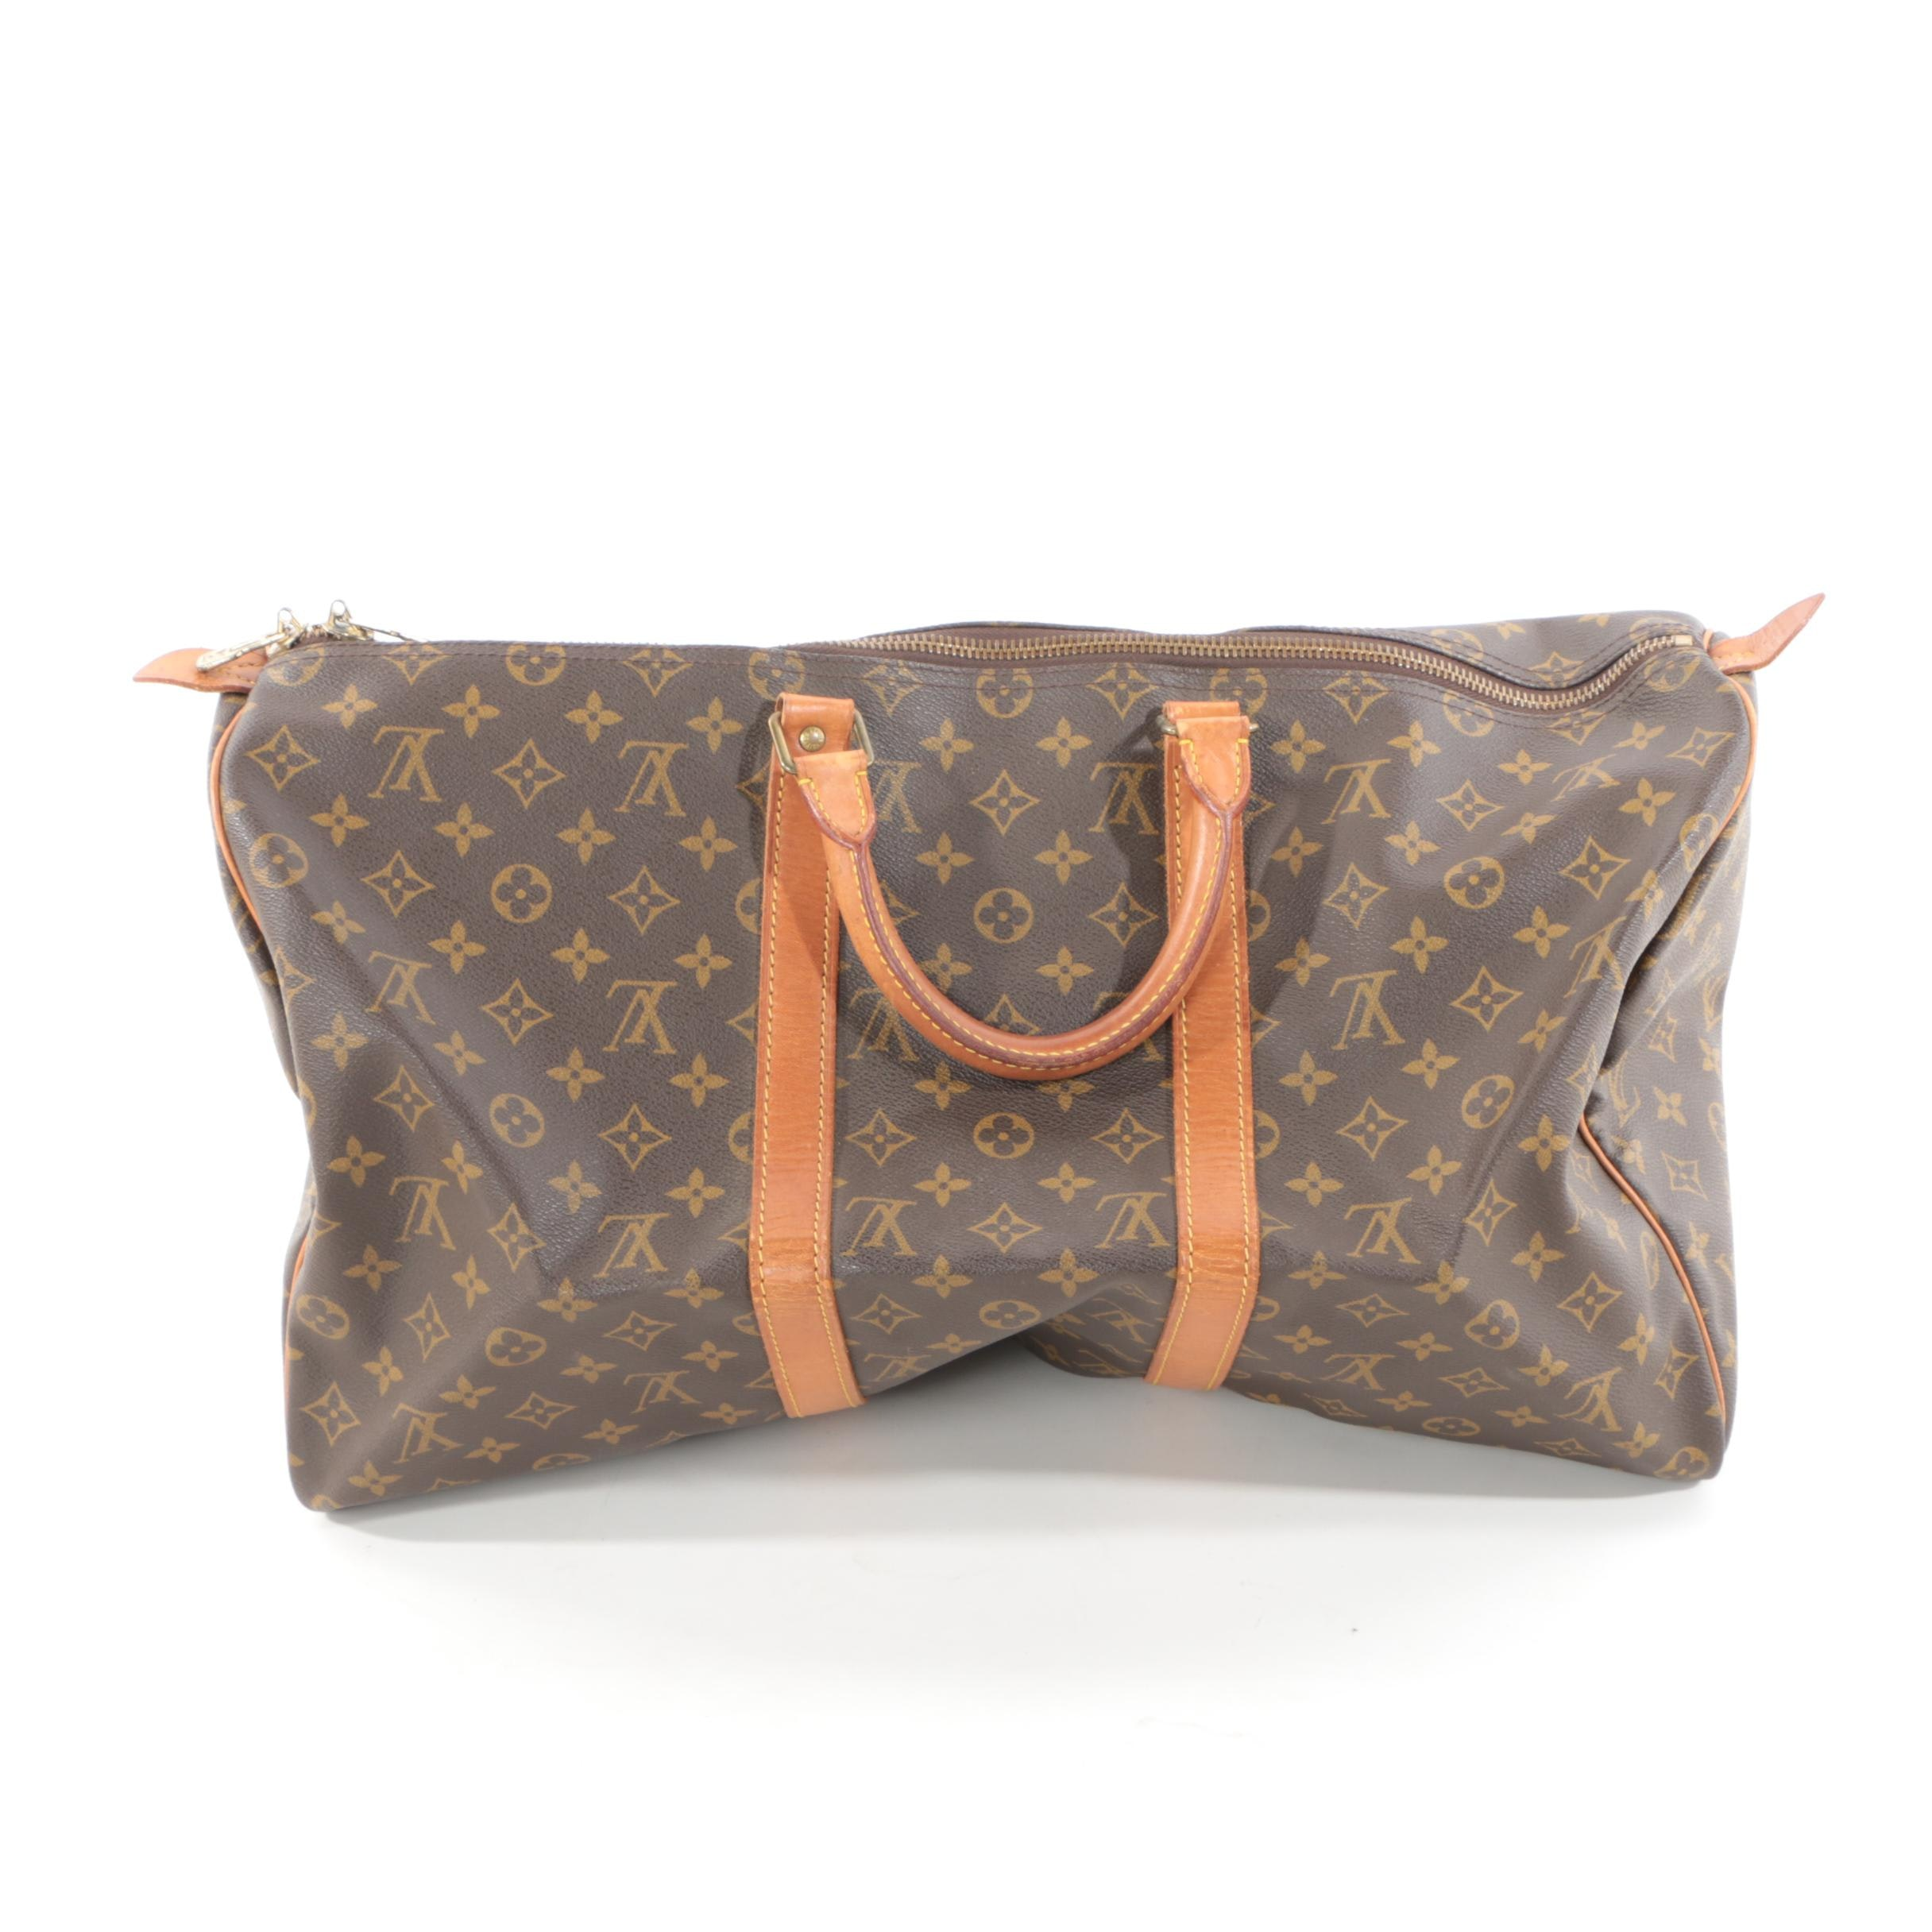 1987 Louis Vuitton of Paris Monogram Canvas 50 Keepall Duffle Bag